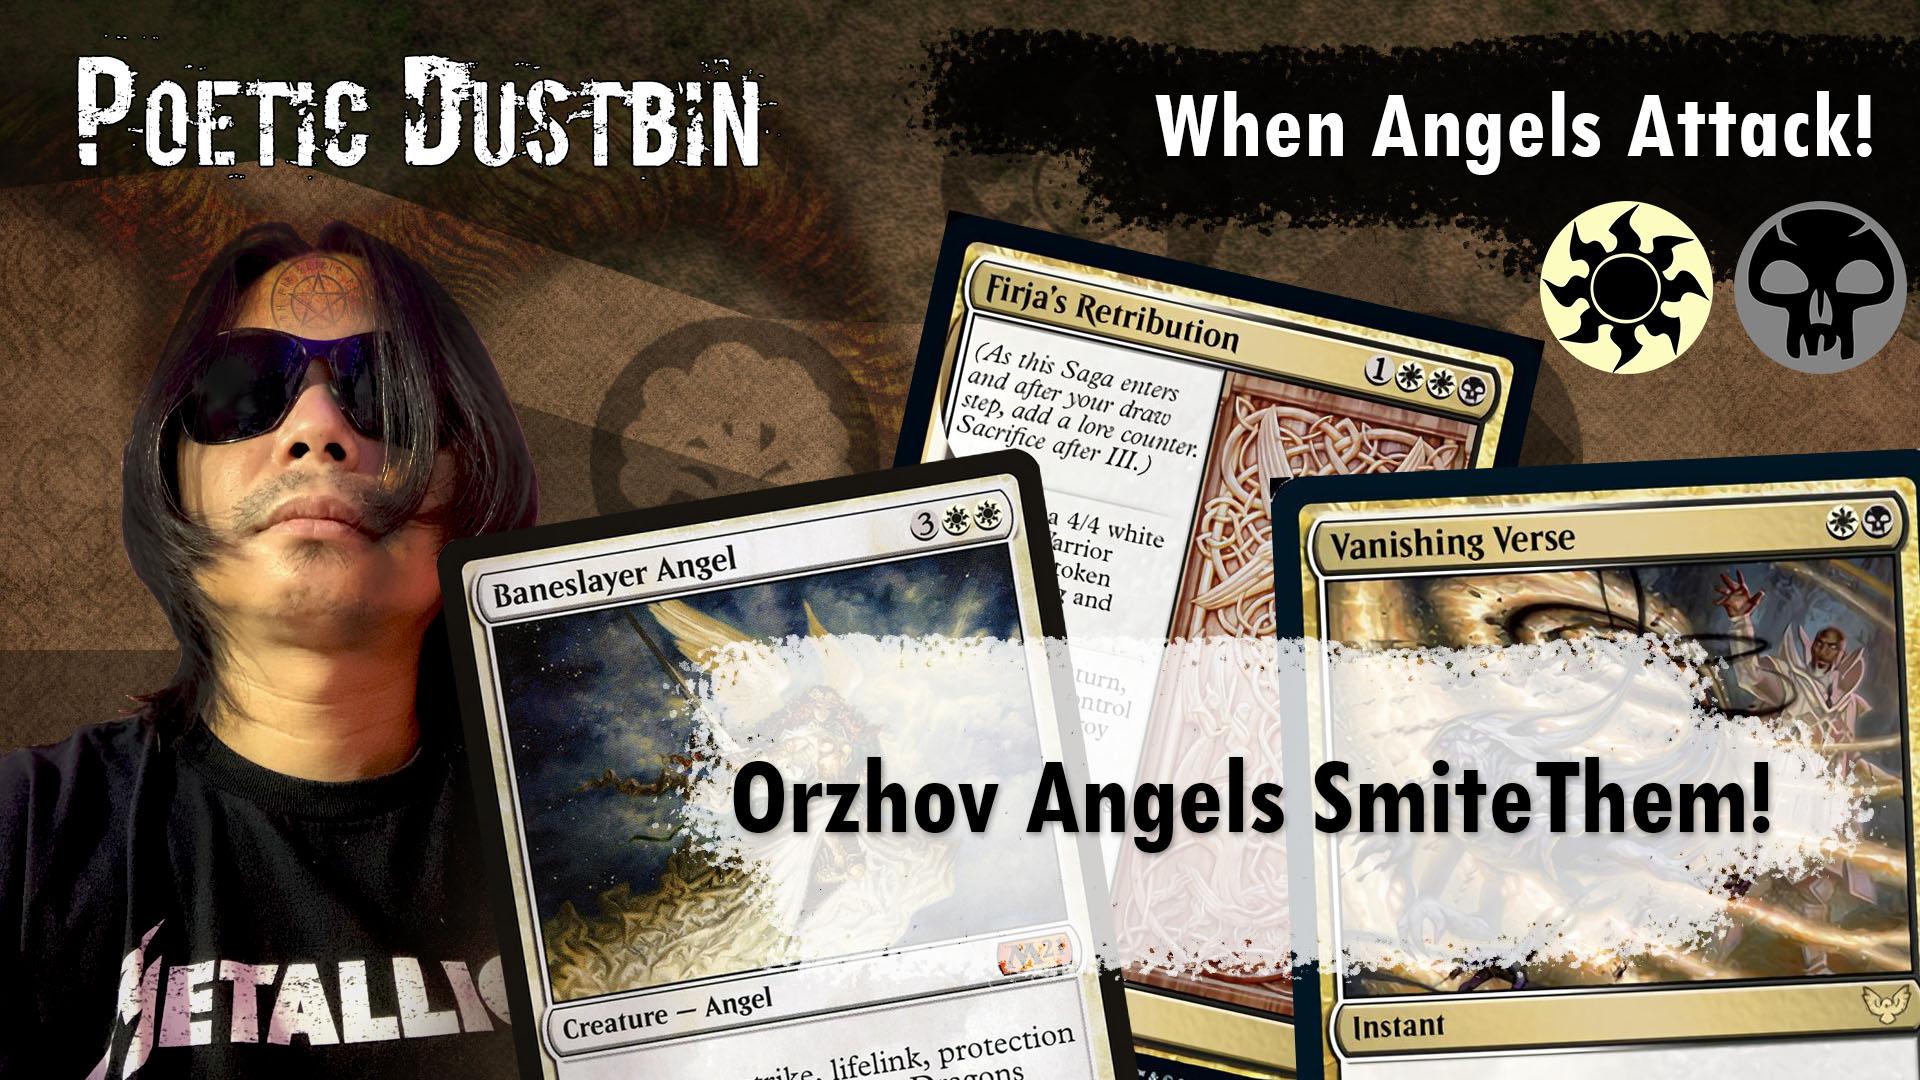 Poetic Dustbin - MTG Arena - Standard Strixhaven Orzhov Angel Deck with Yorion, Baneslayer Angel and Vanishing Verse